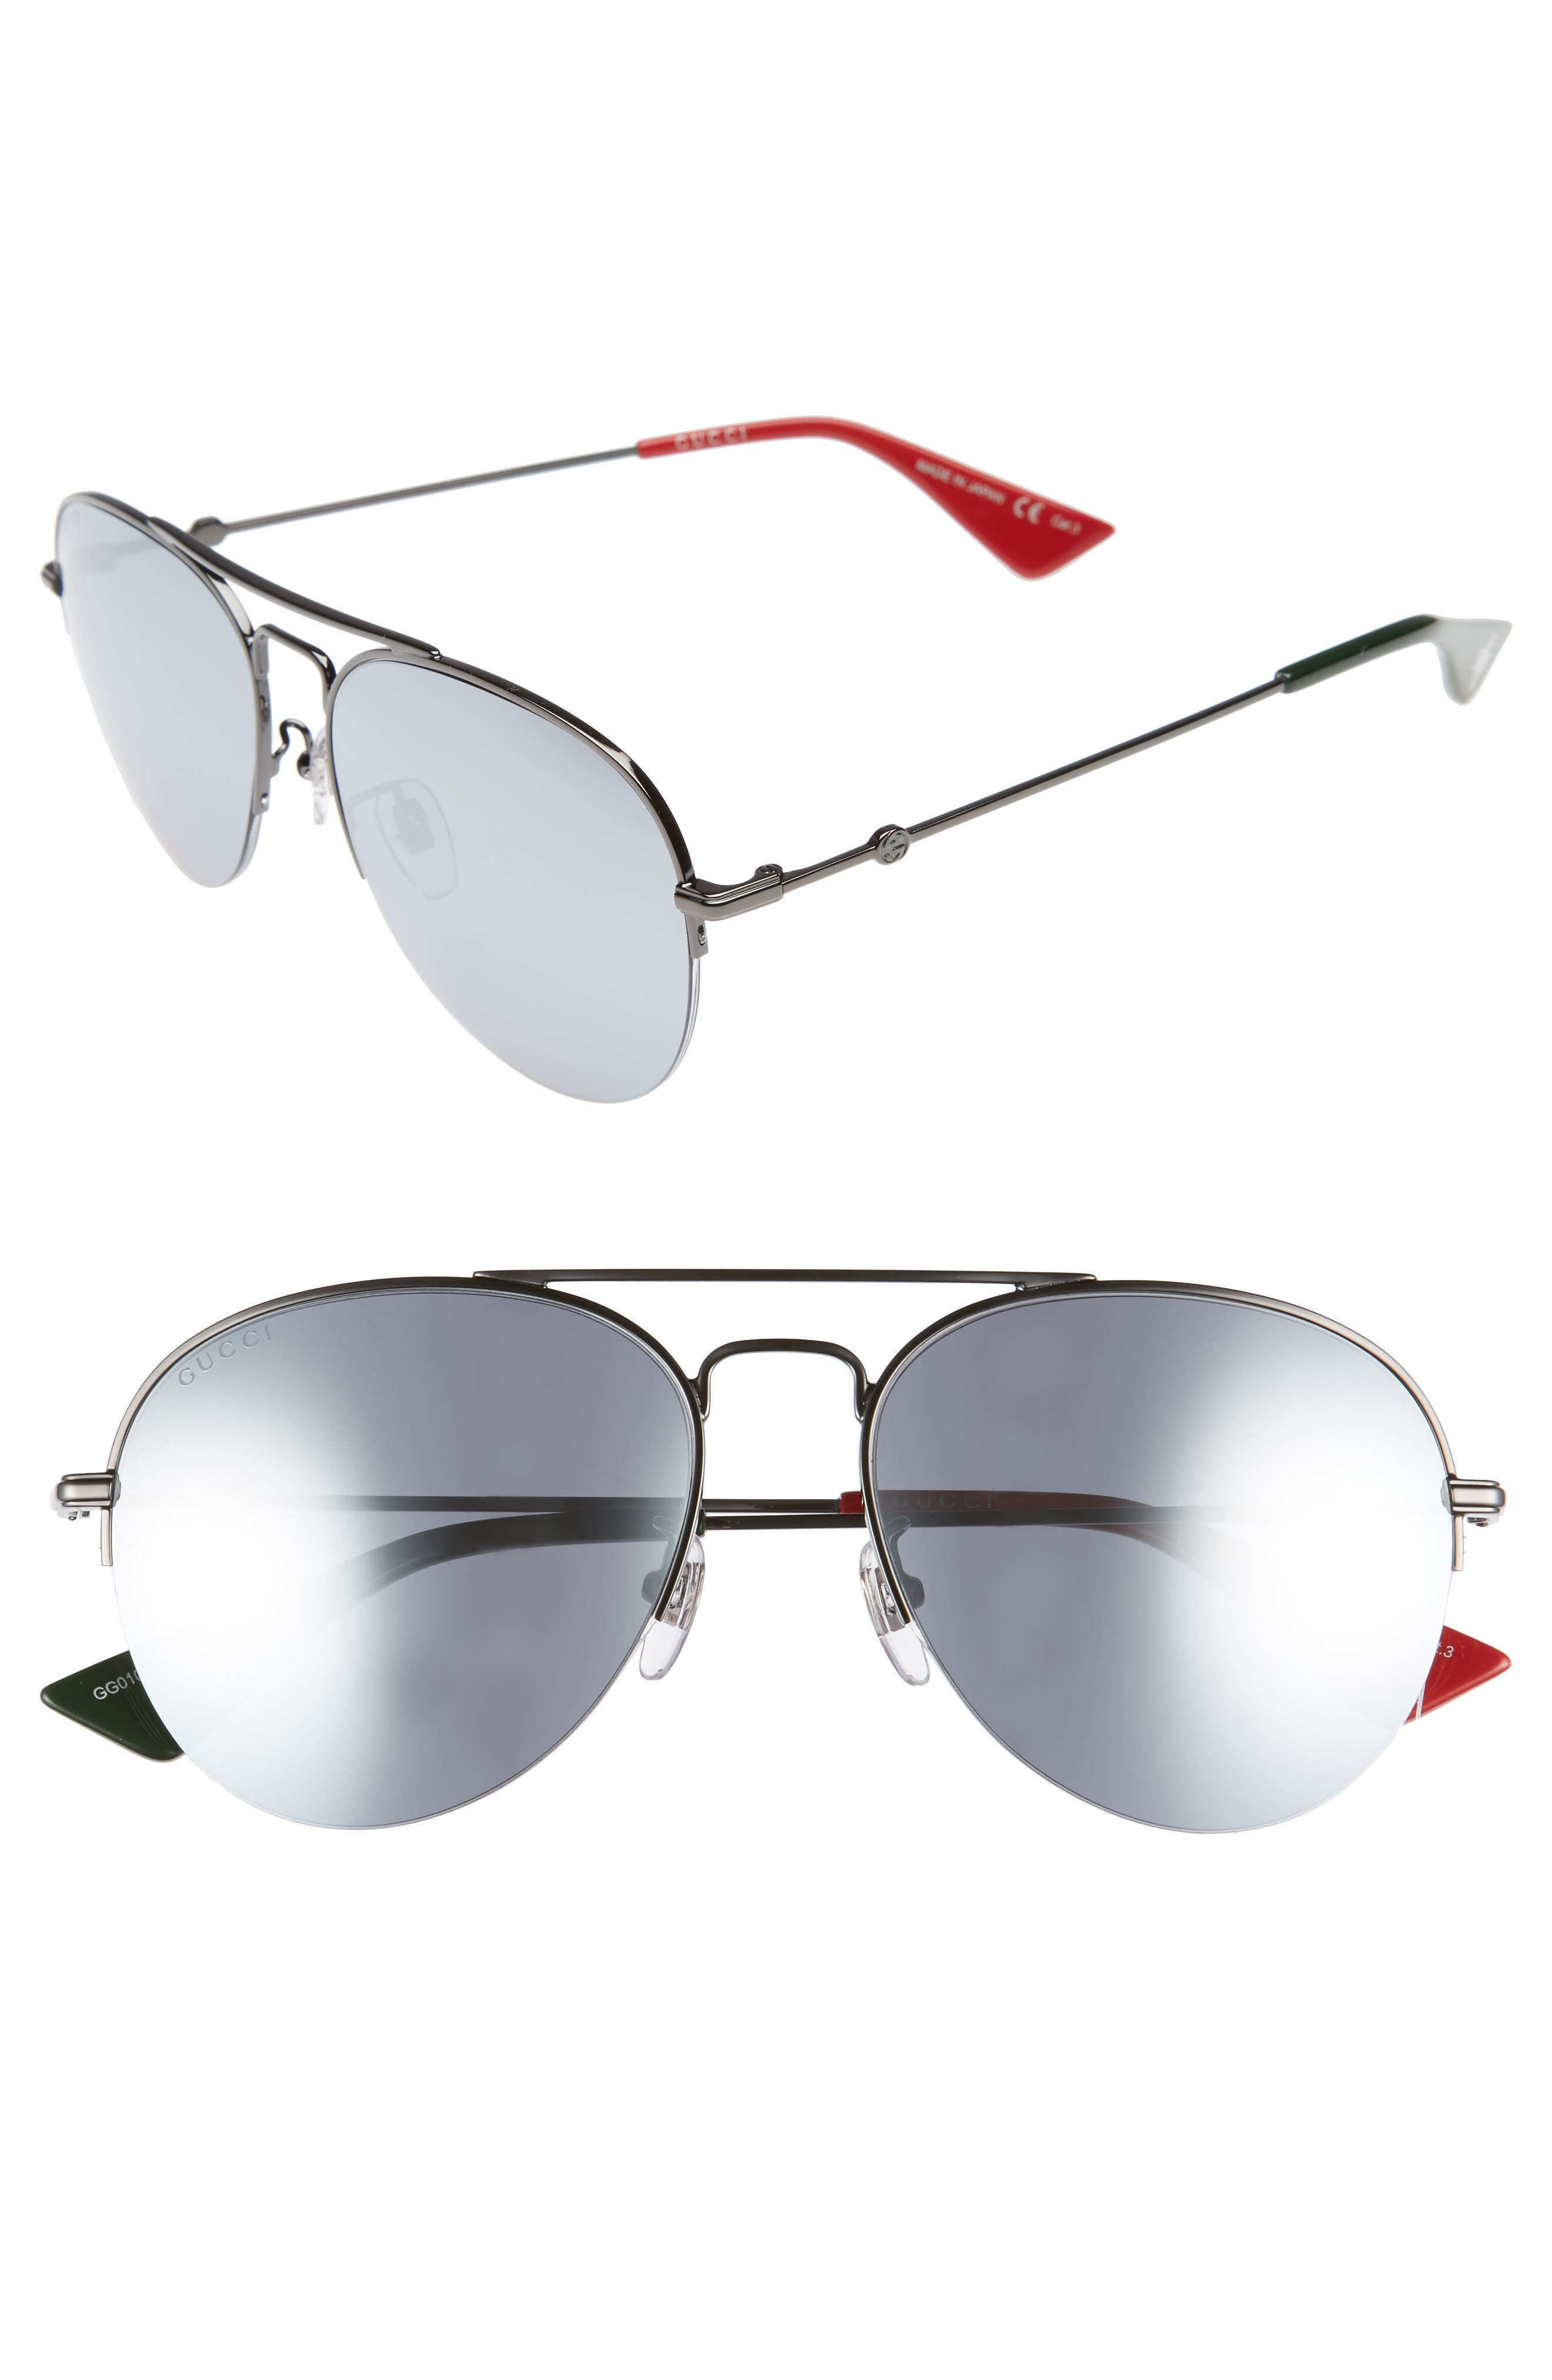 56mm Aviator Sunglasses,                             Main thumbnail 1, color,                             040